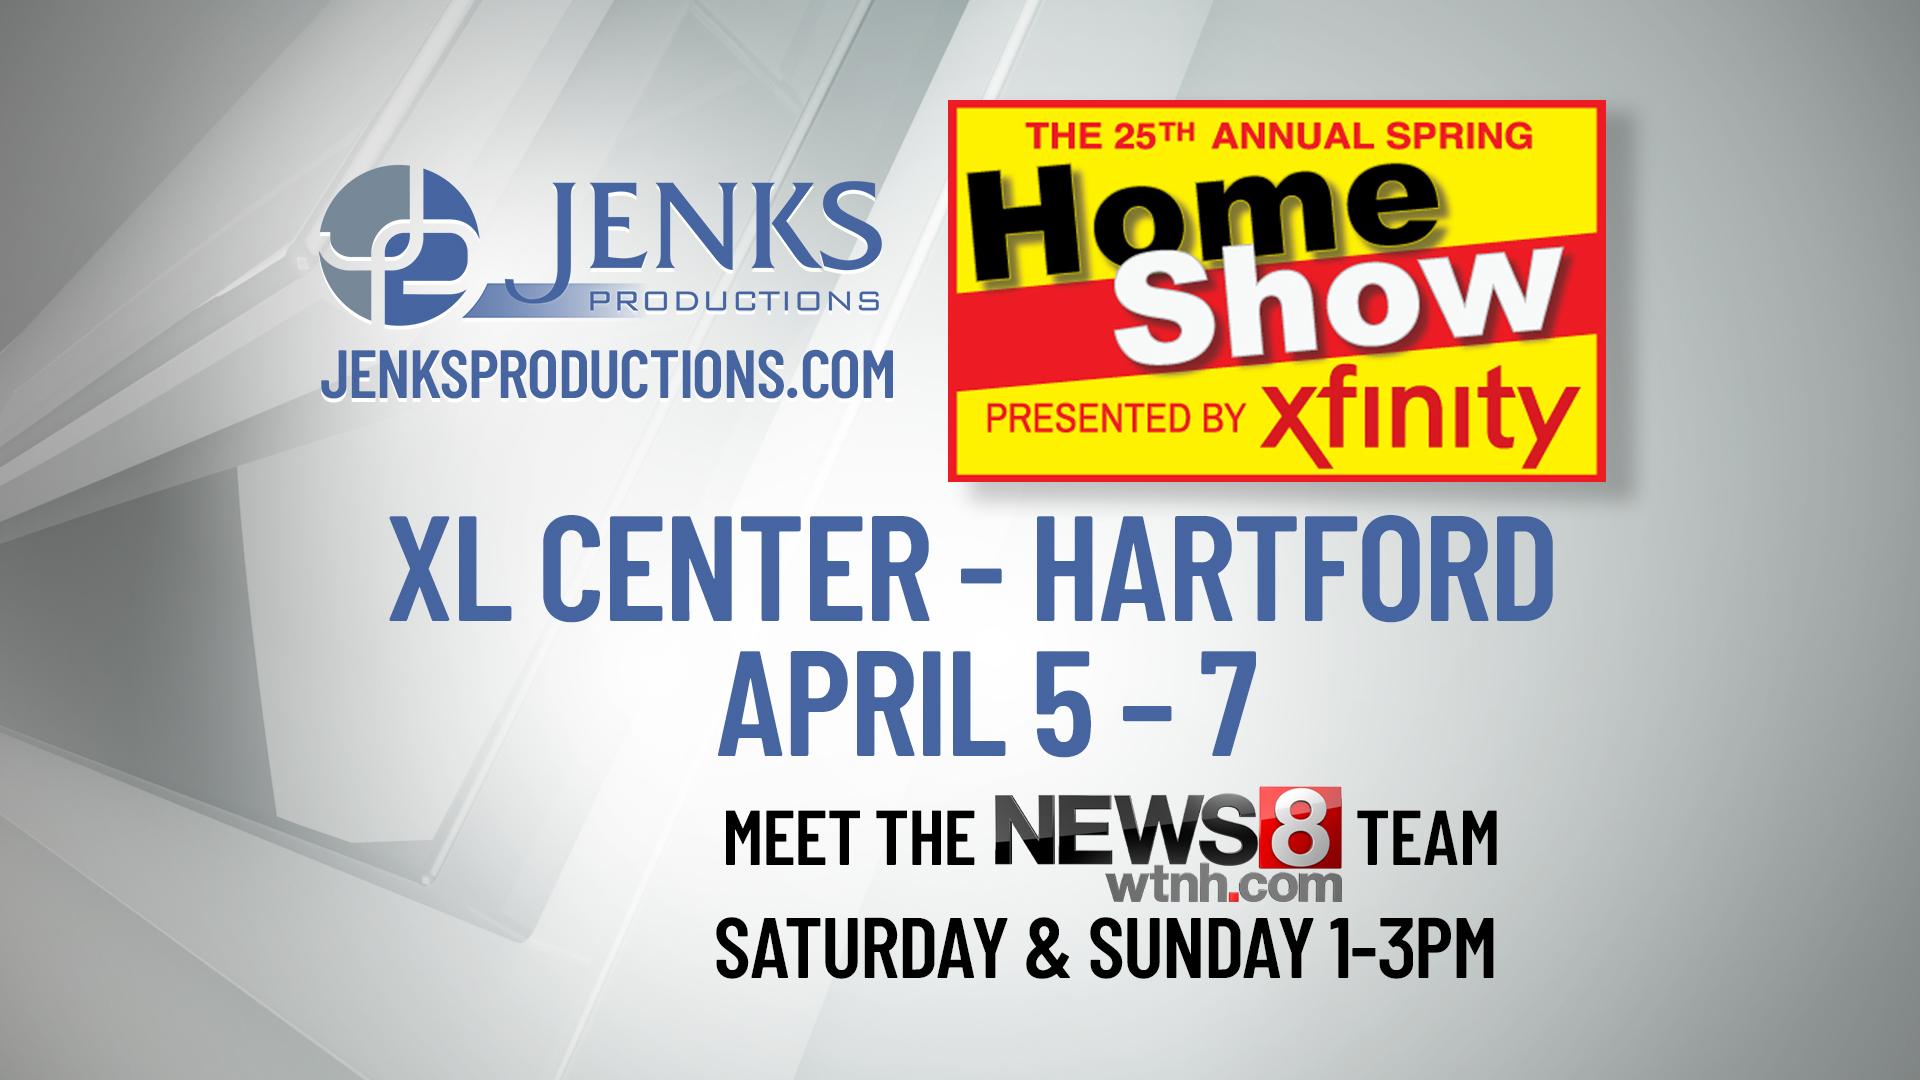 Jenks-APR2019-Home-Show-FS_1554323965968.jpg